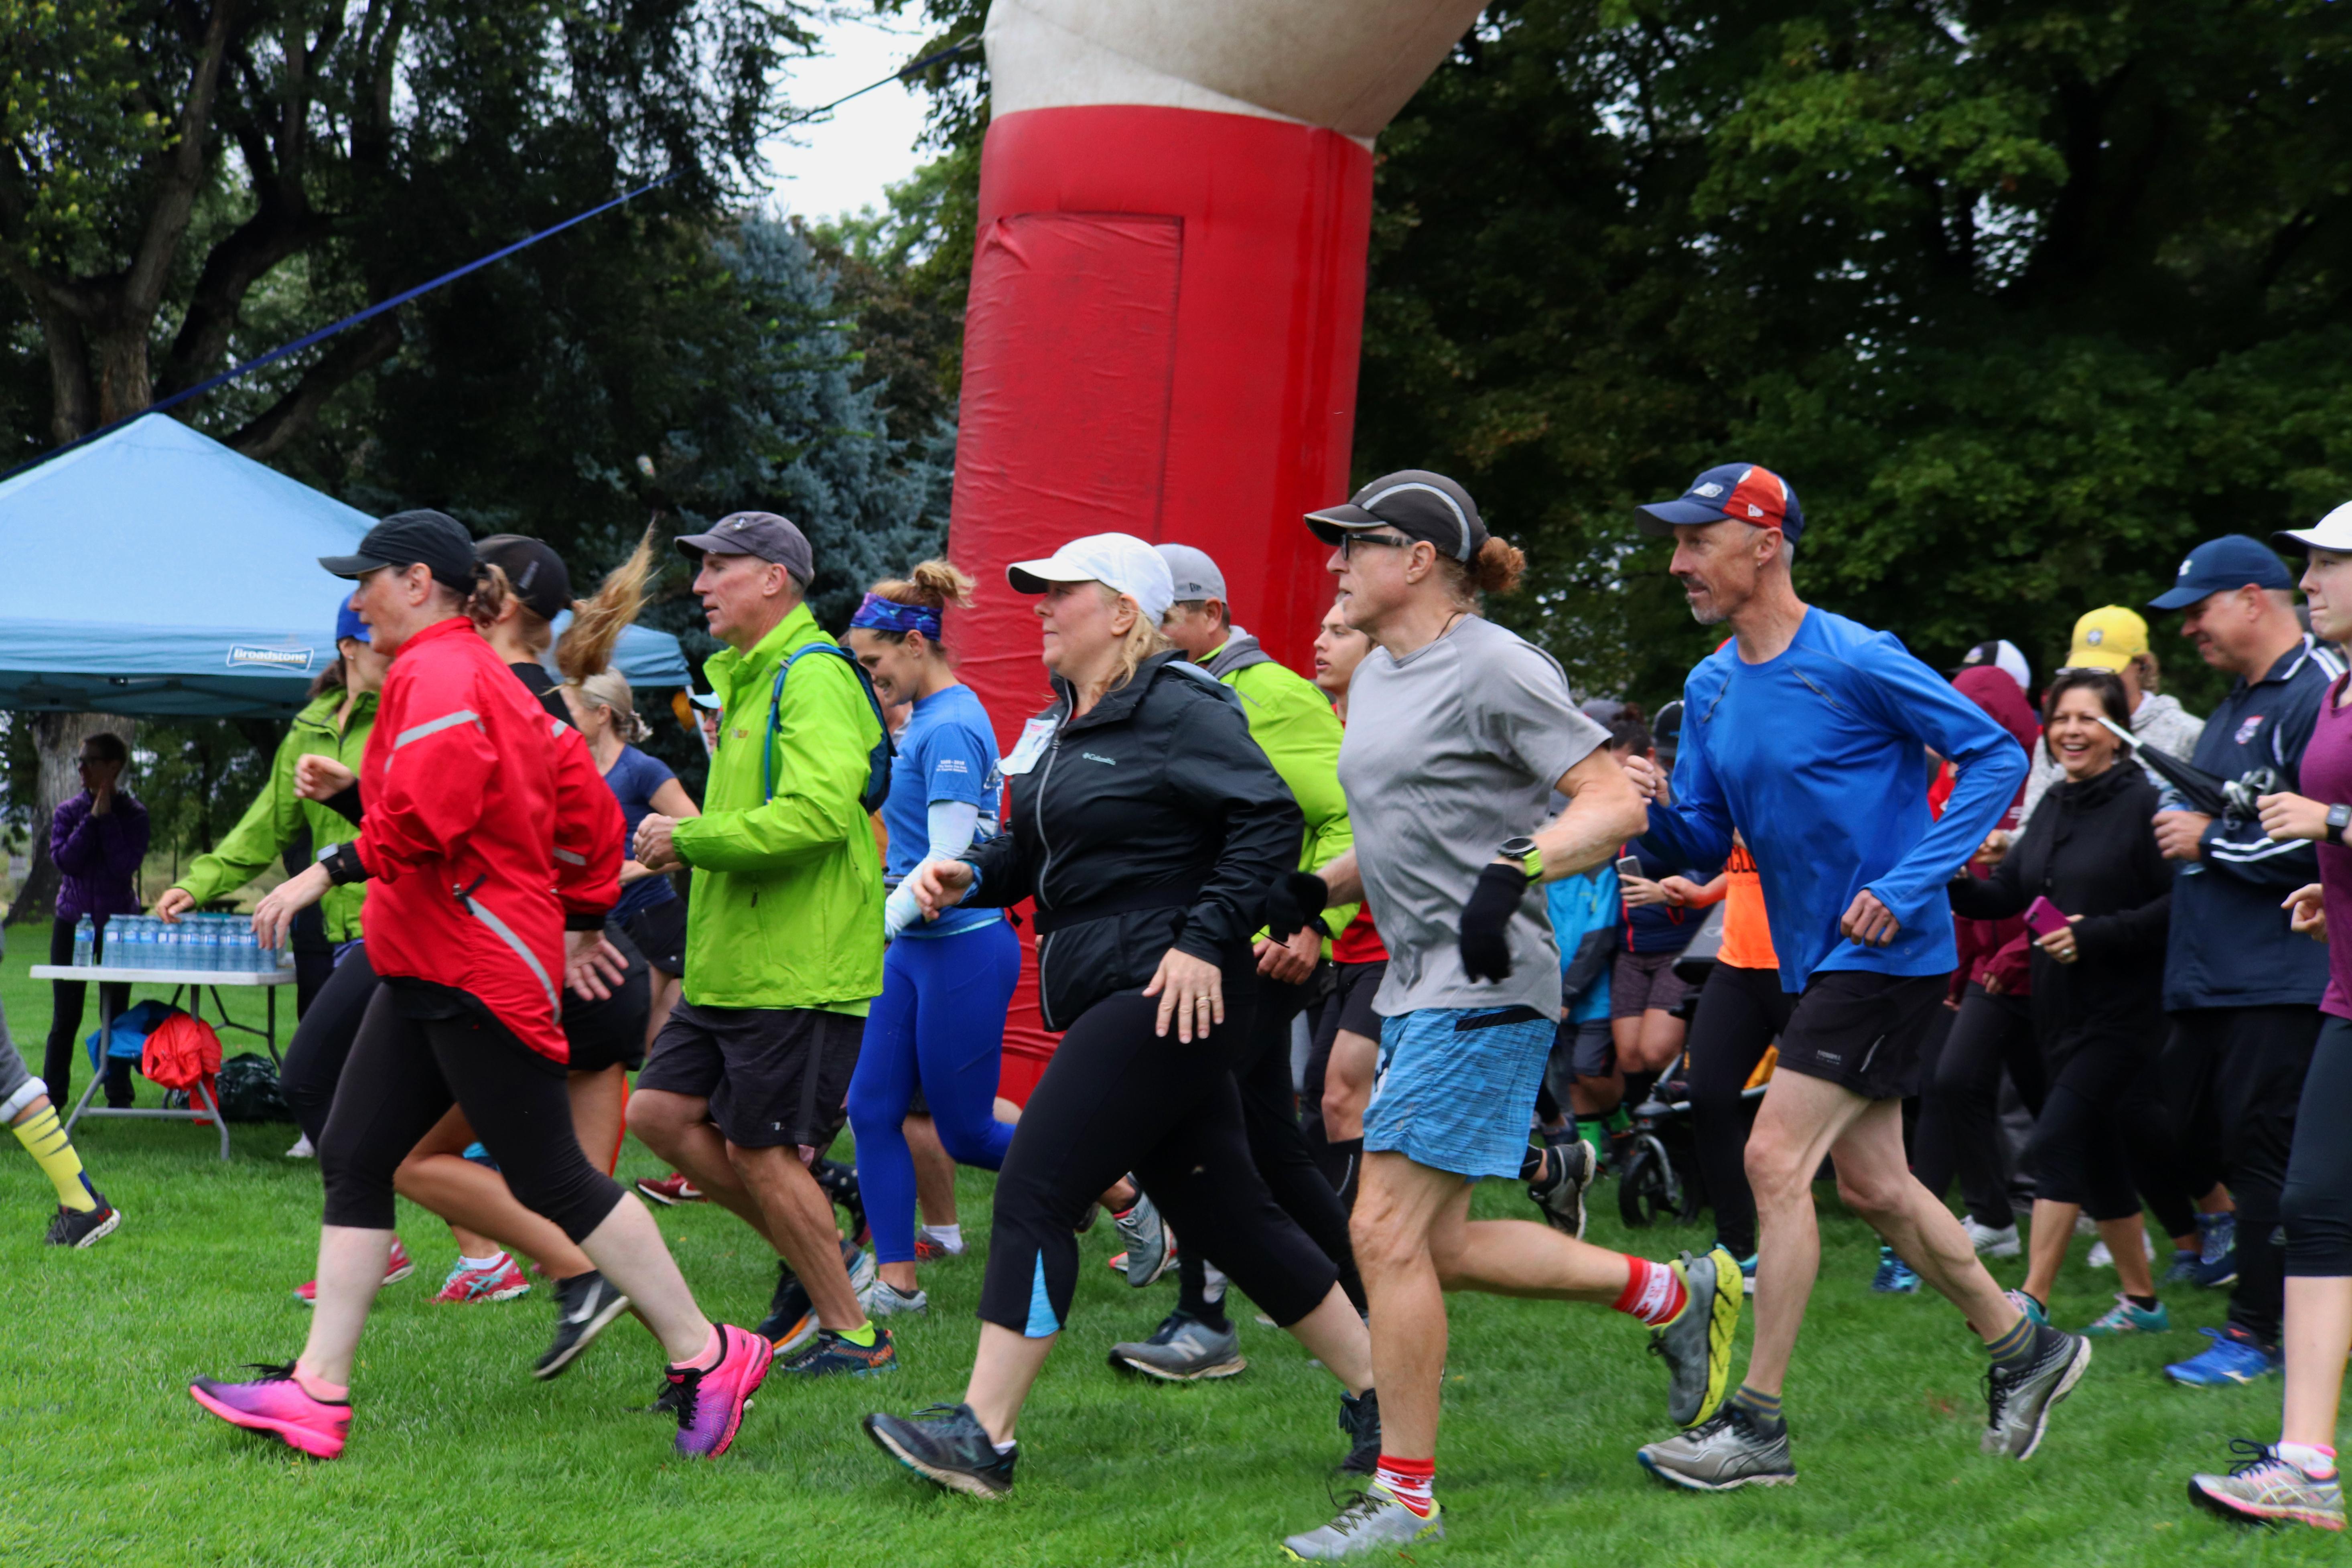 PHOTOS: Rain doesn't dampen spirits at Kamloops Terry Fox Run